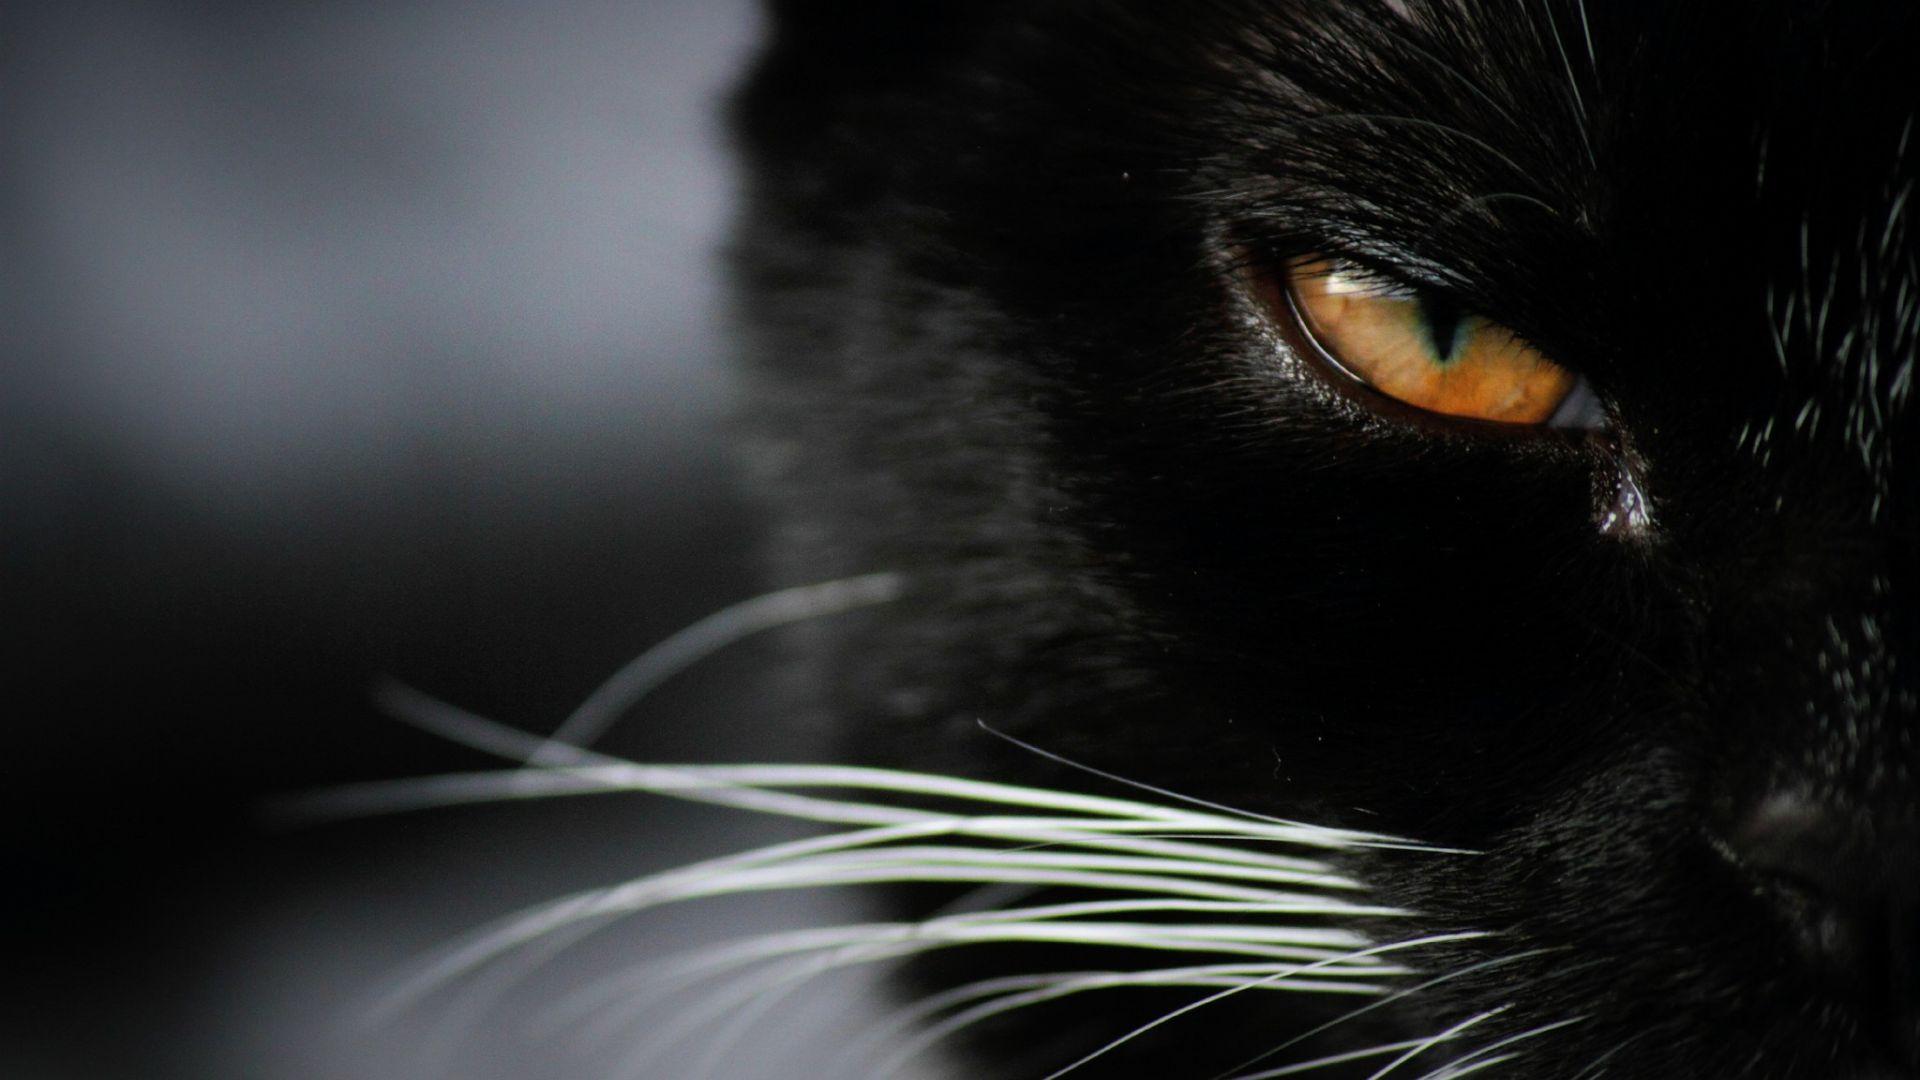 Wallpaper Angry Black cat eye, close up